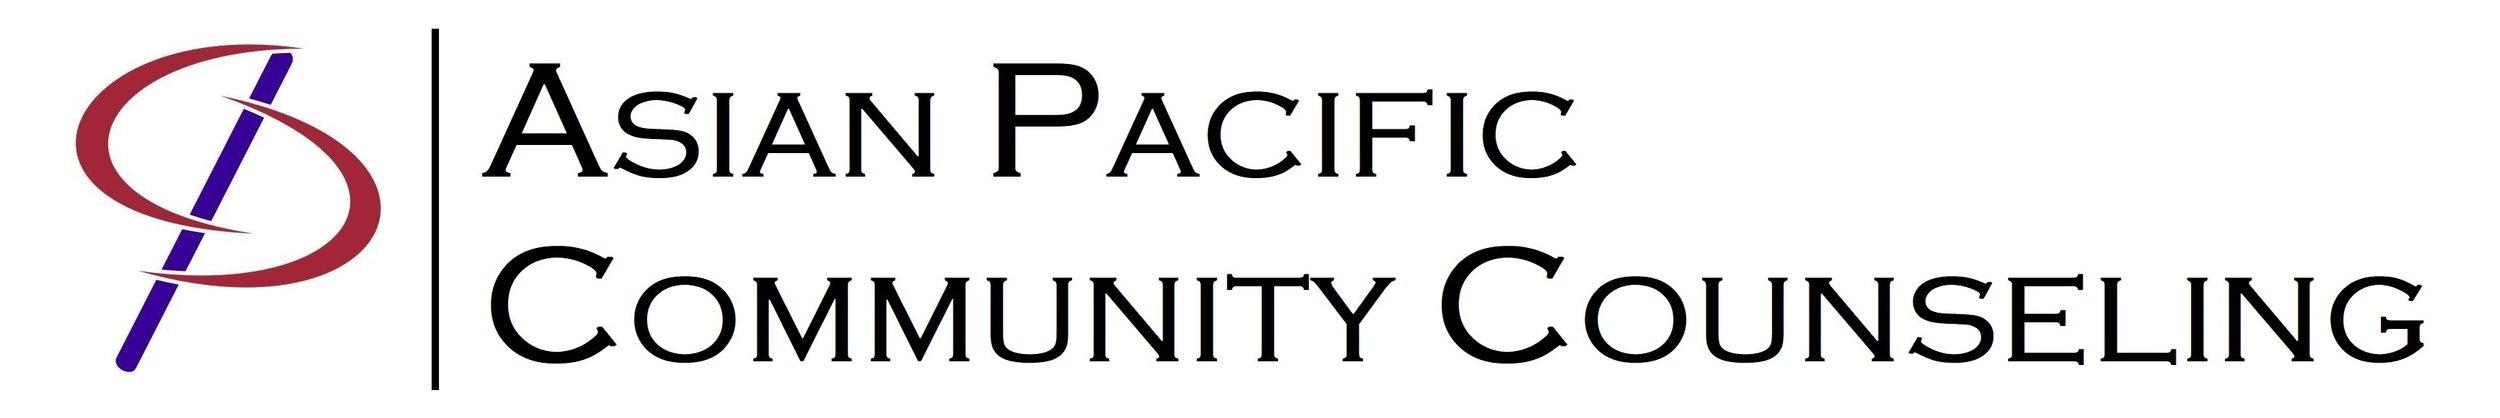 APCC Logo.jpg